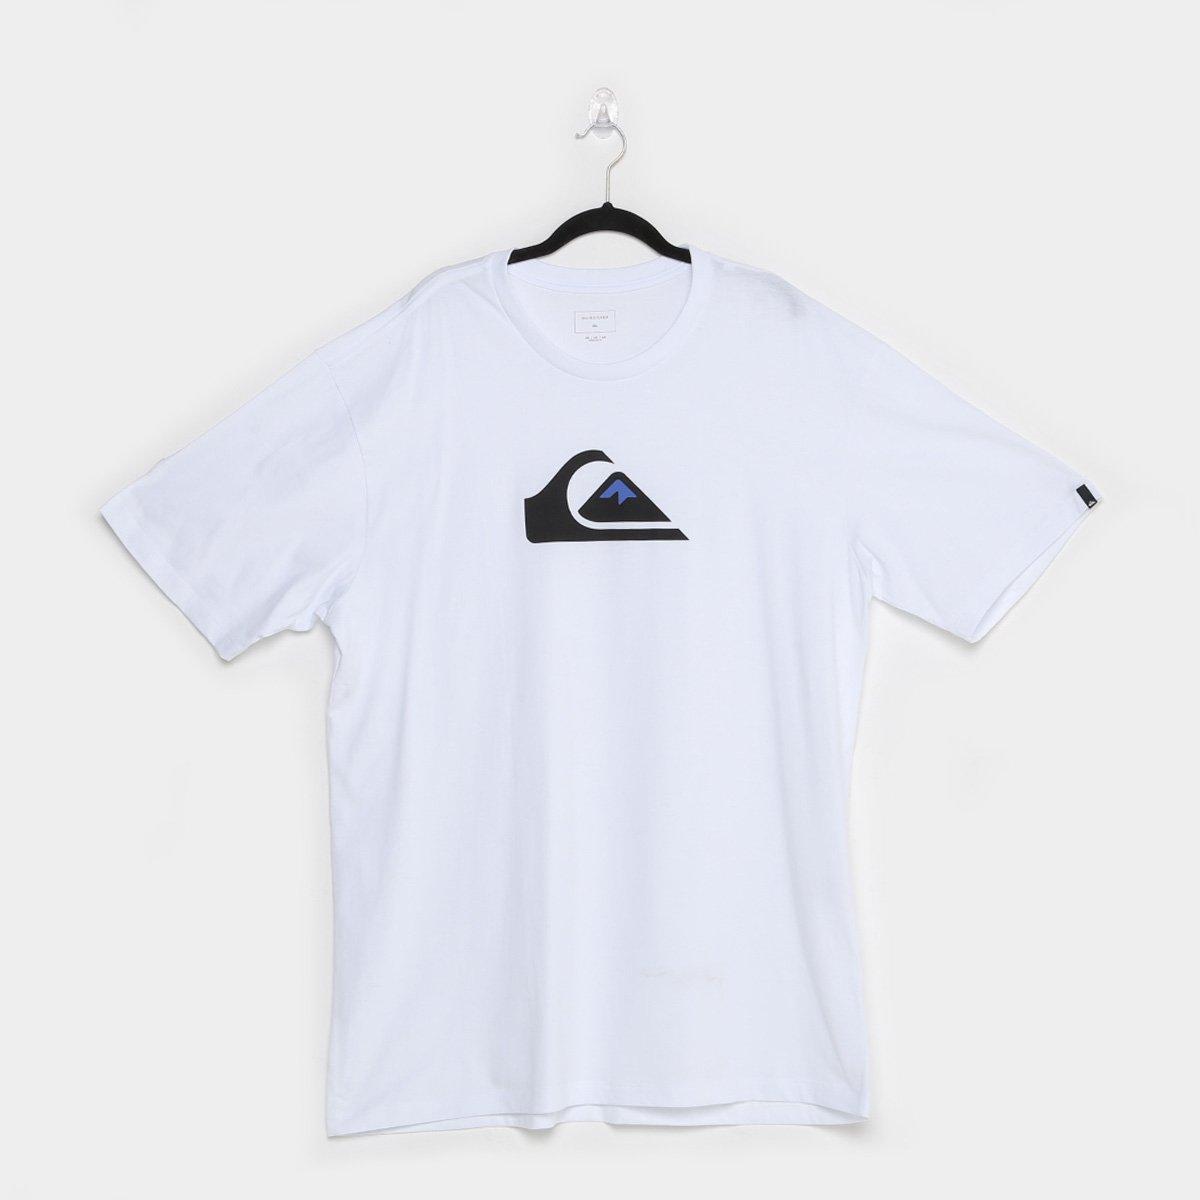 Camiseta Quiksilver Mountain & Wave Plus Size Masculina